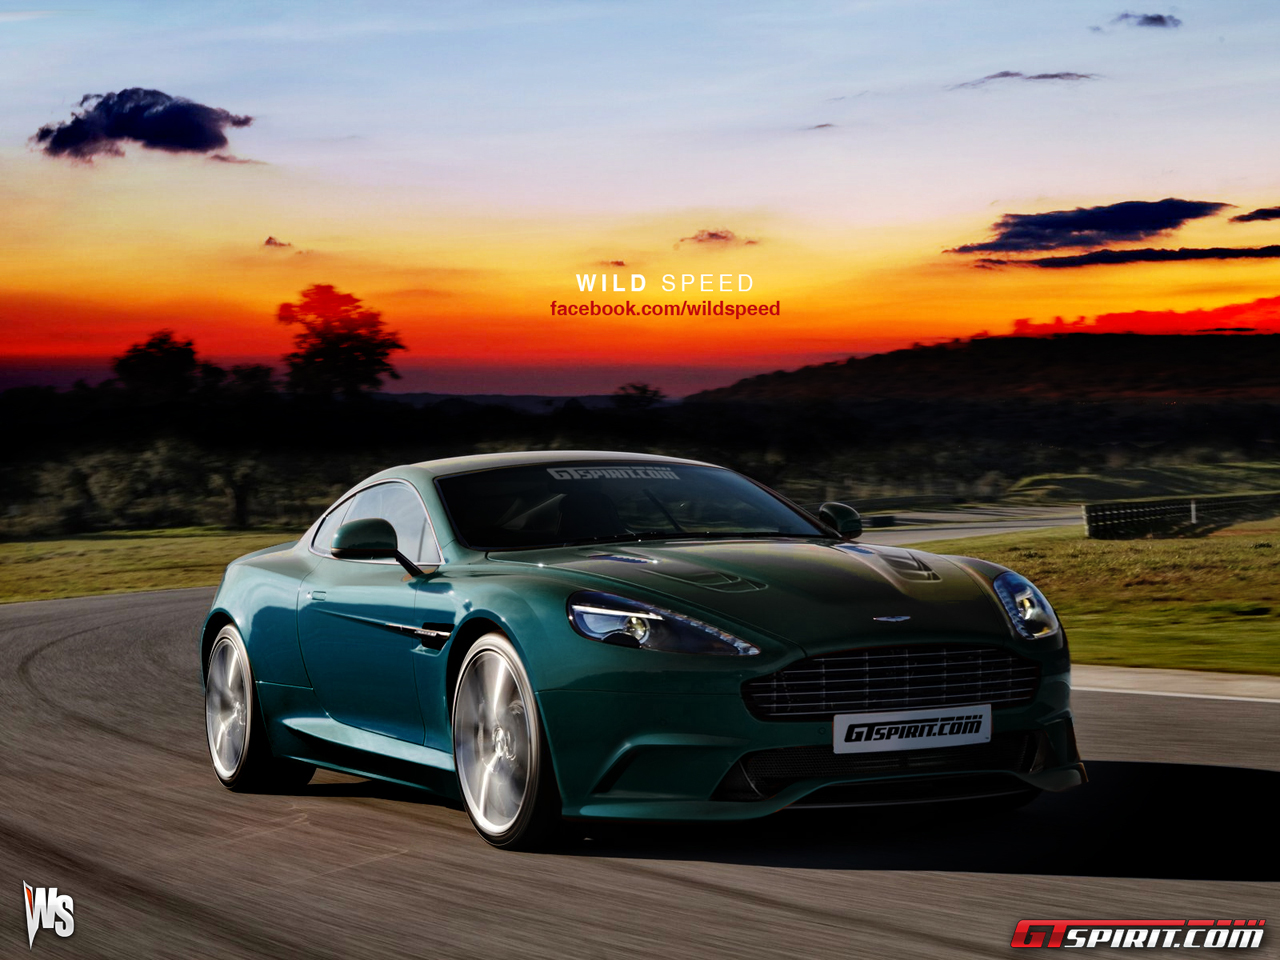 2013 Aston Martin DBS Renderings Photo 1